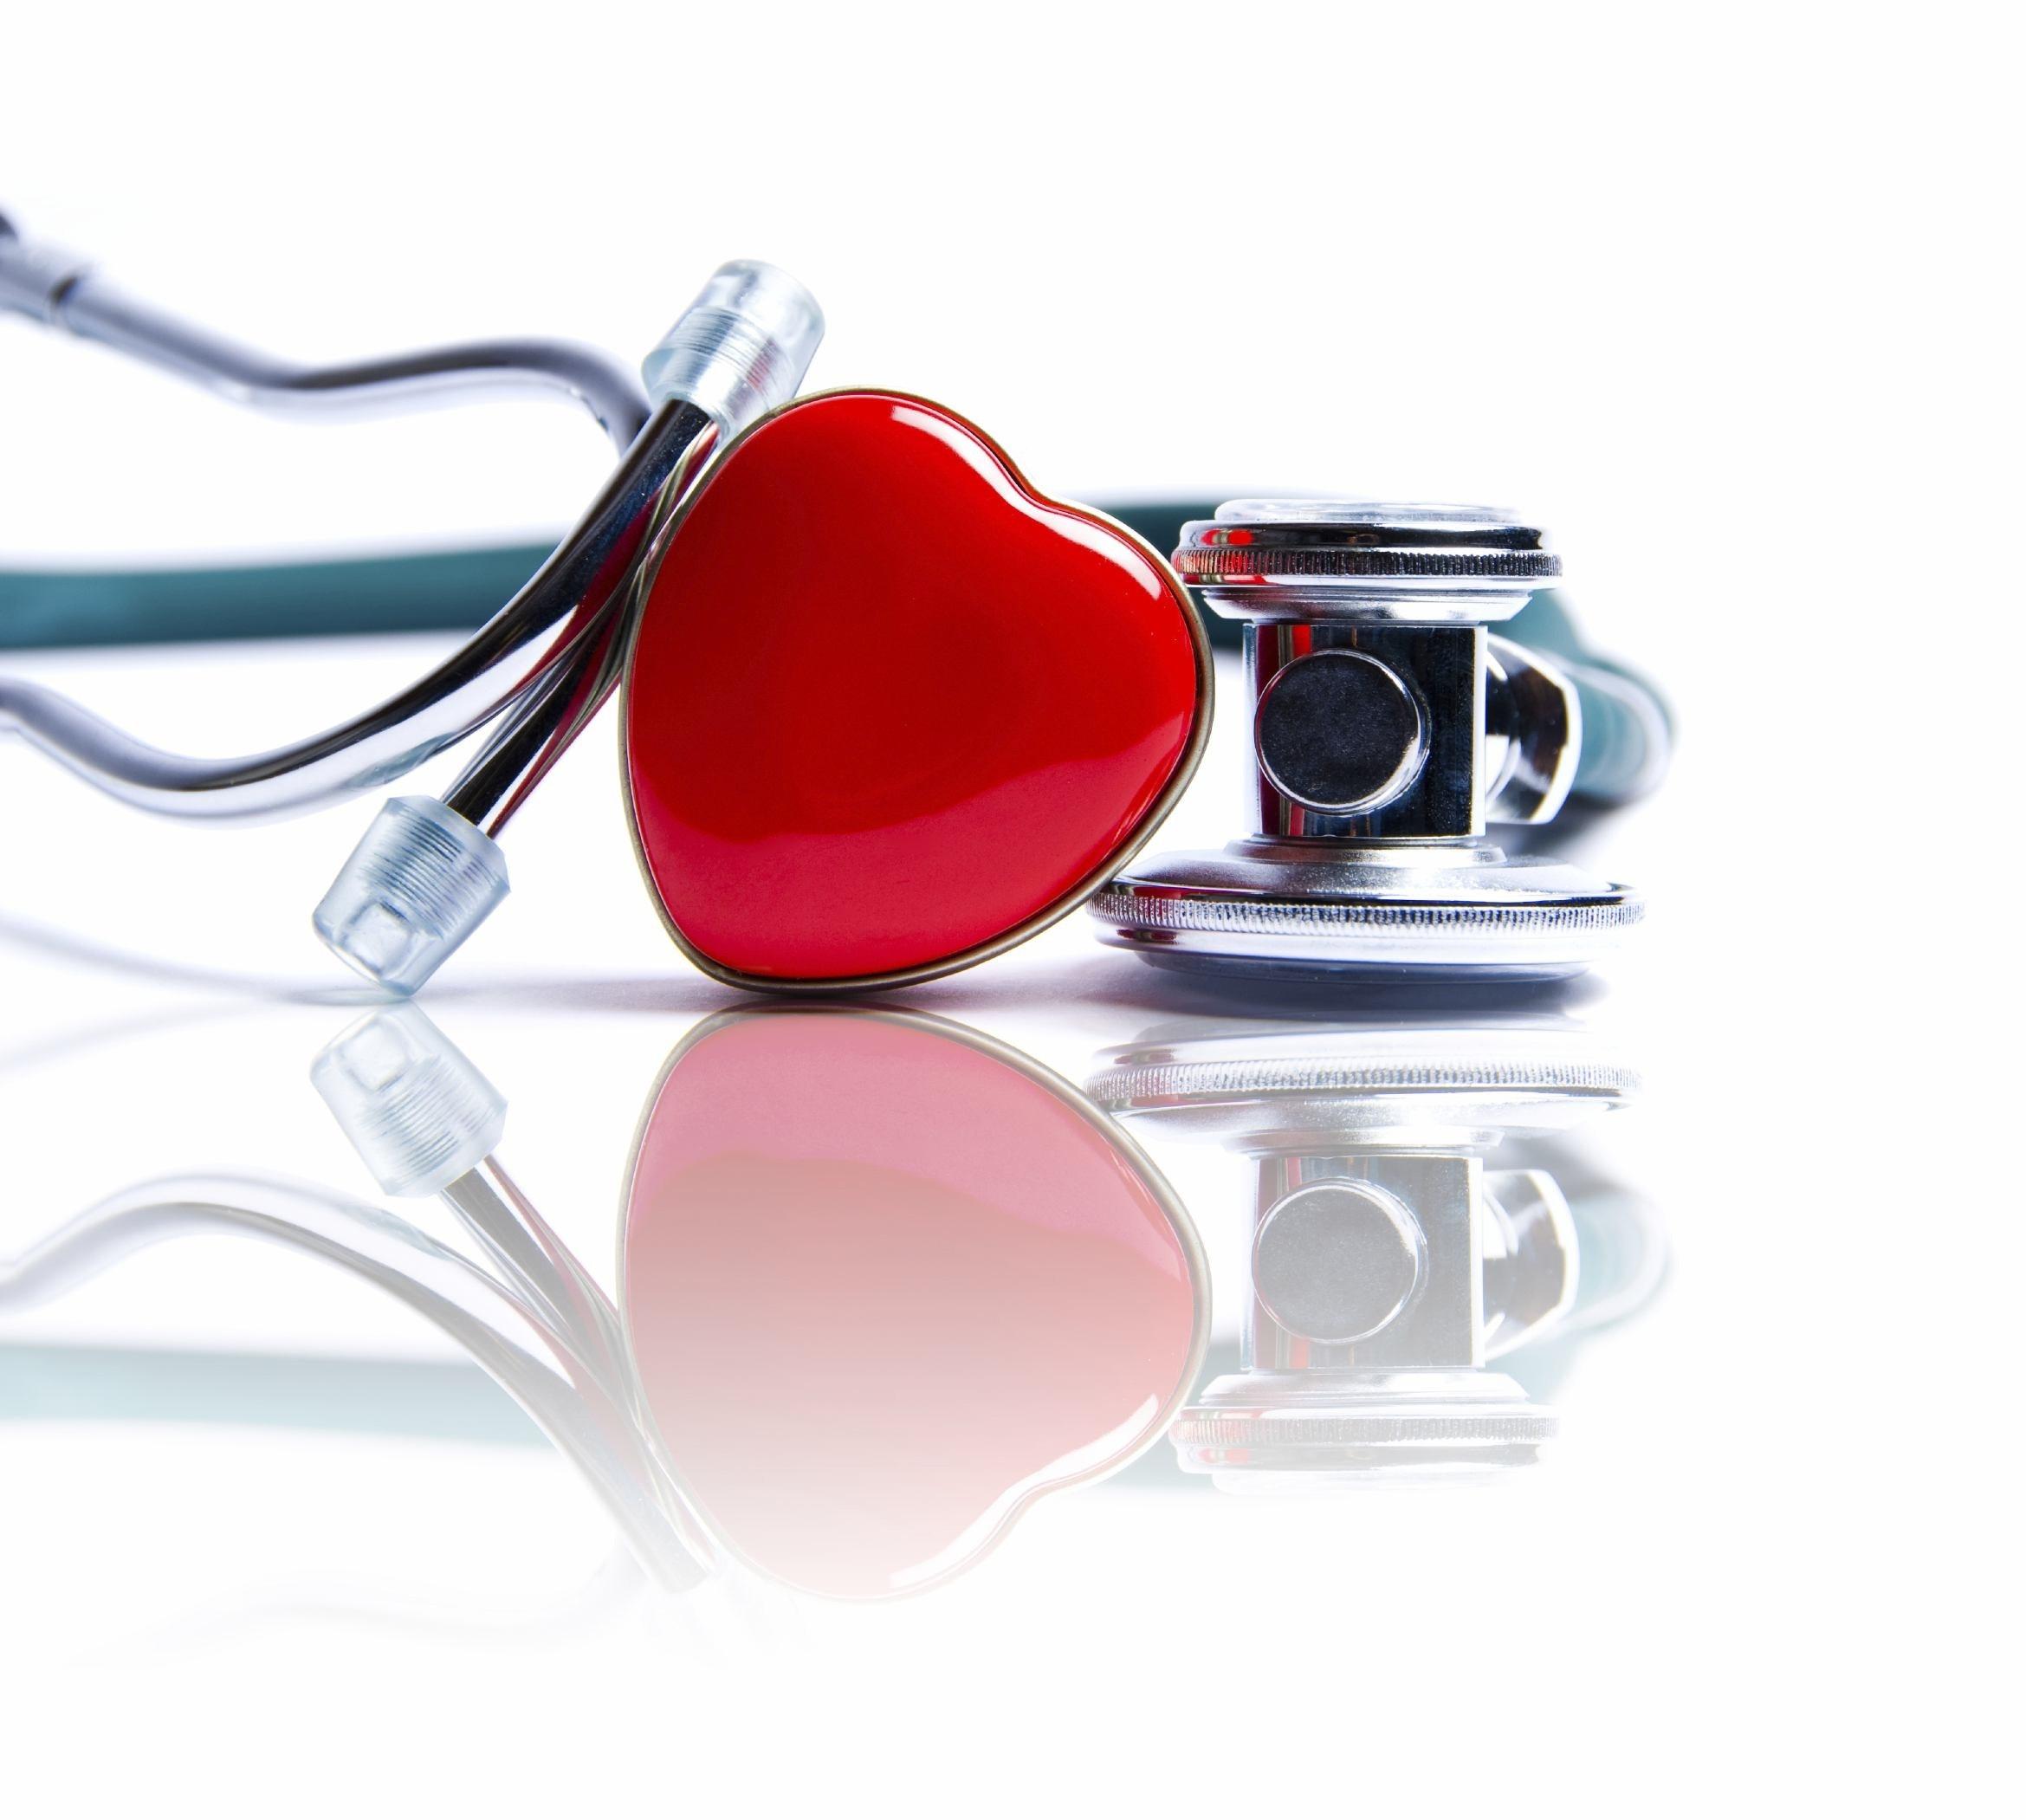 167 Romantic Heart Pictures Pexels Free Stock Photos